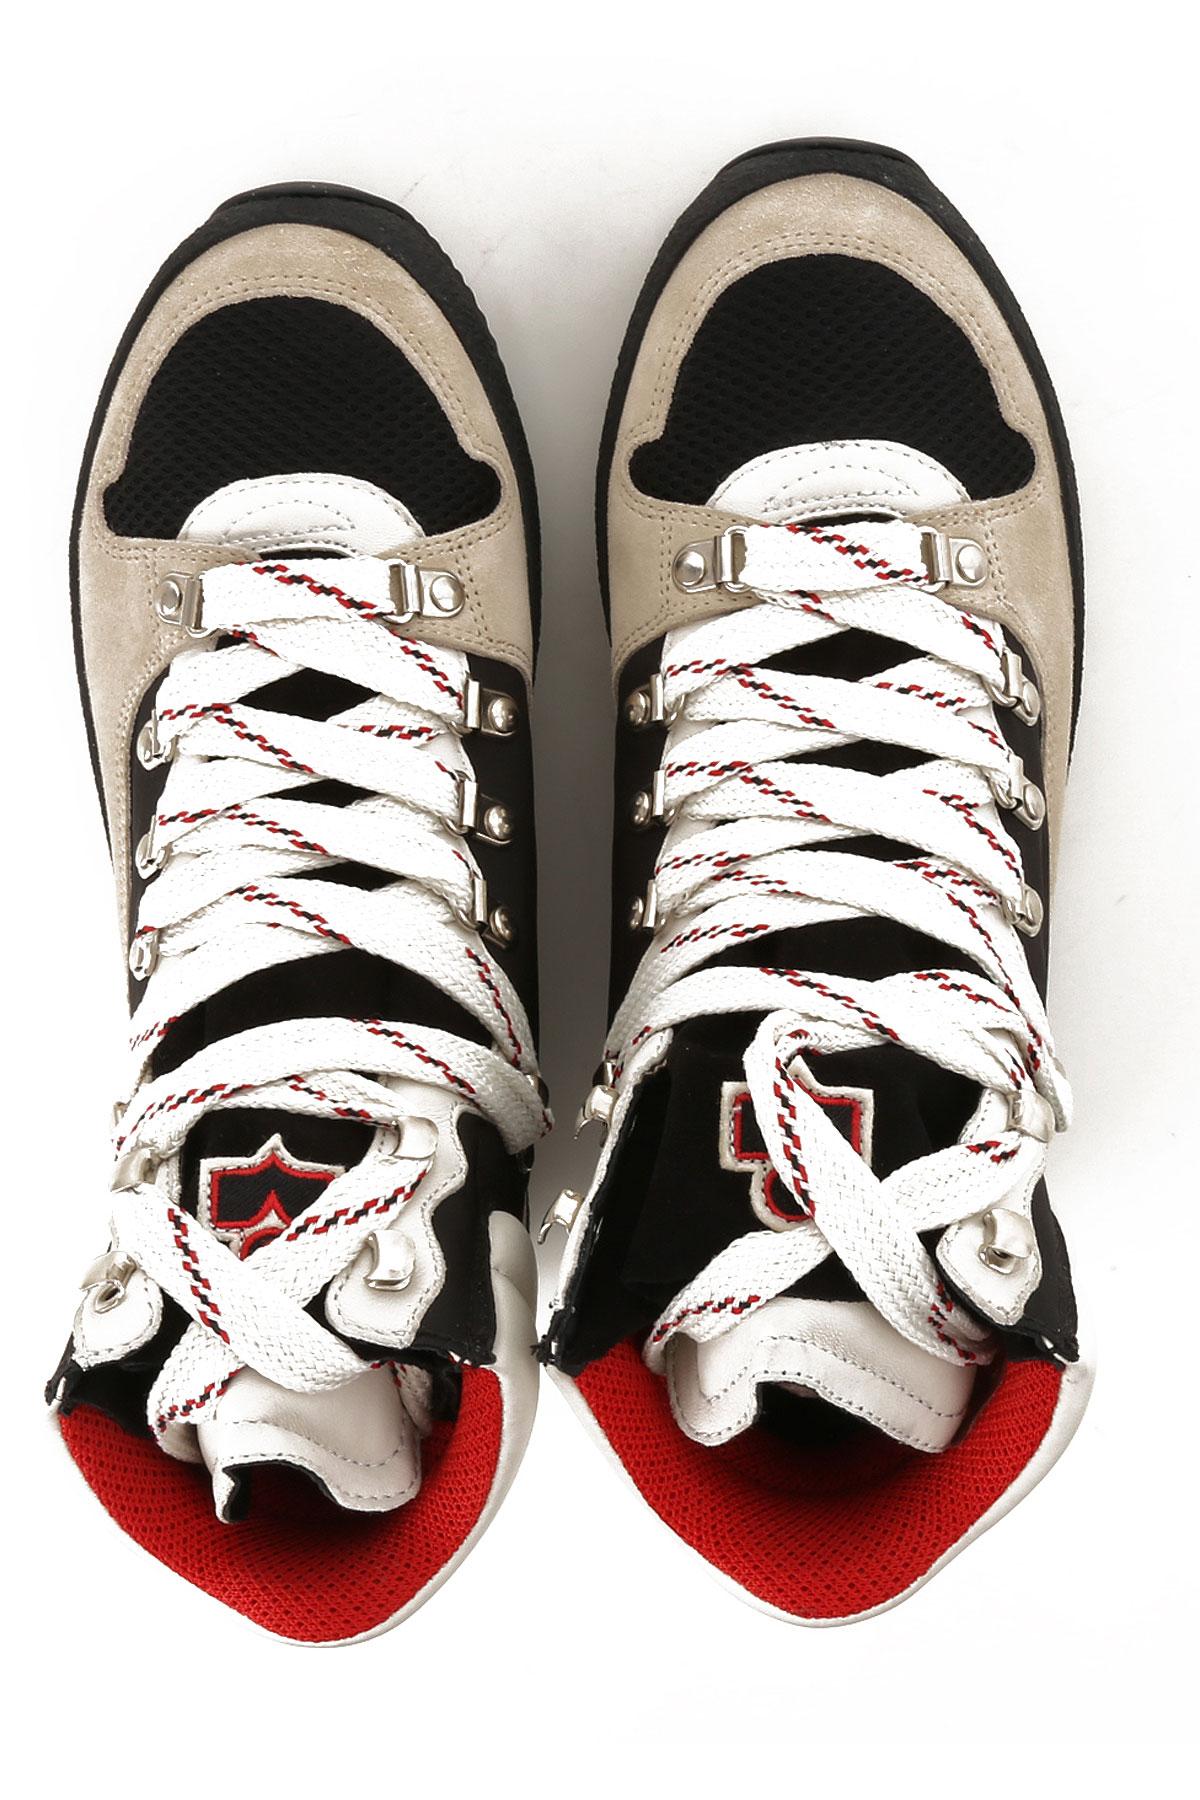 19 nbsp;rojo Negro Zapatos Otoño Marant Isabel 2018 Para Beige Mujer invierno qw4x0C